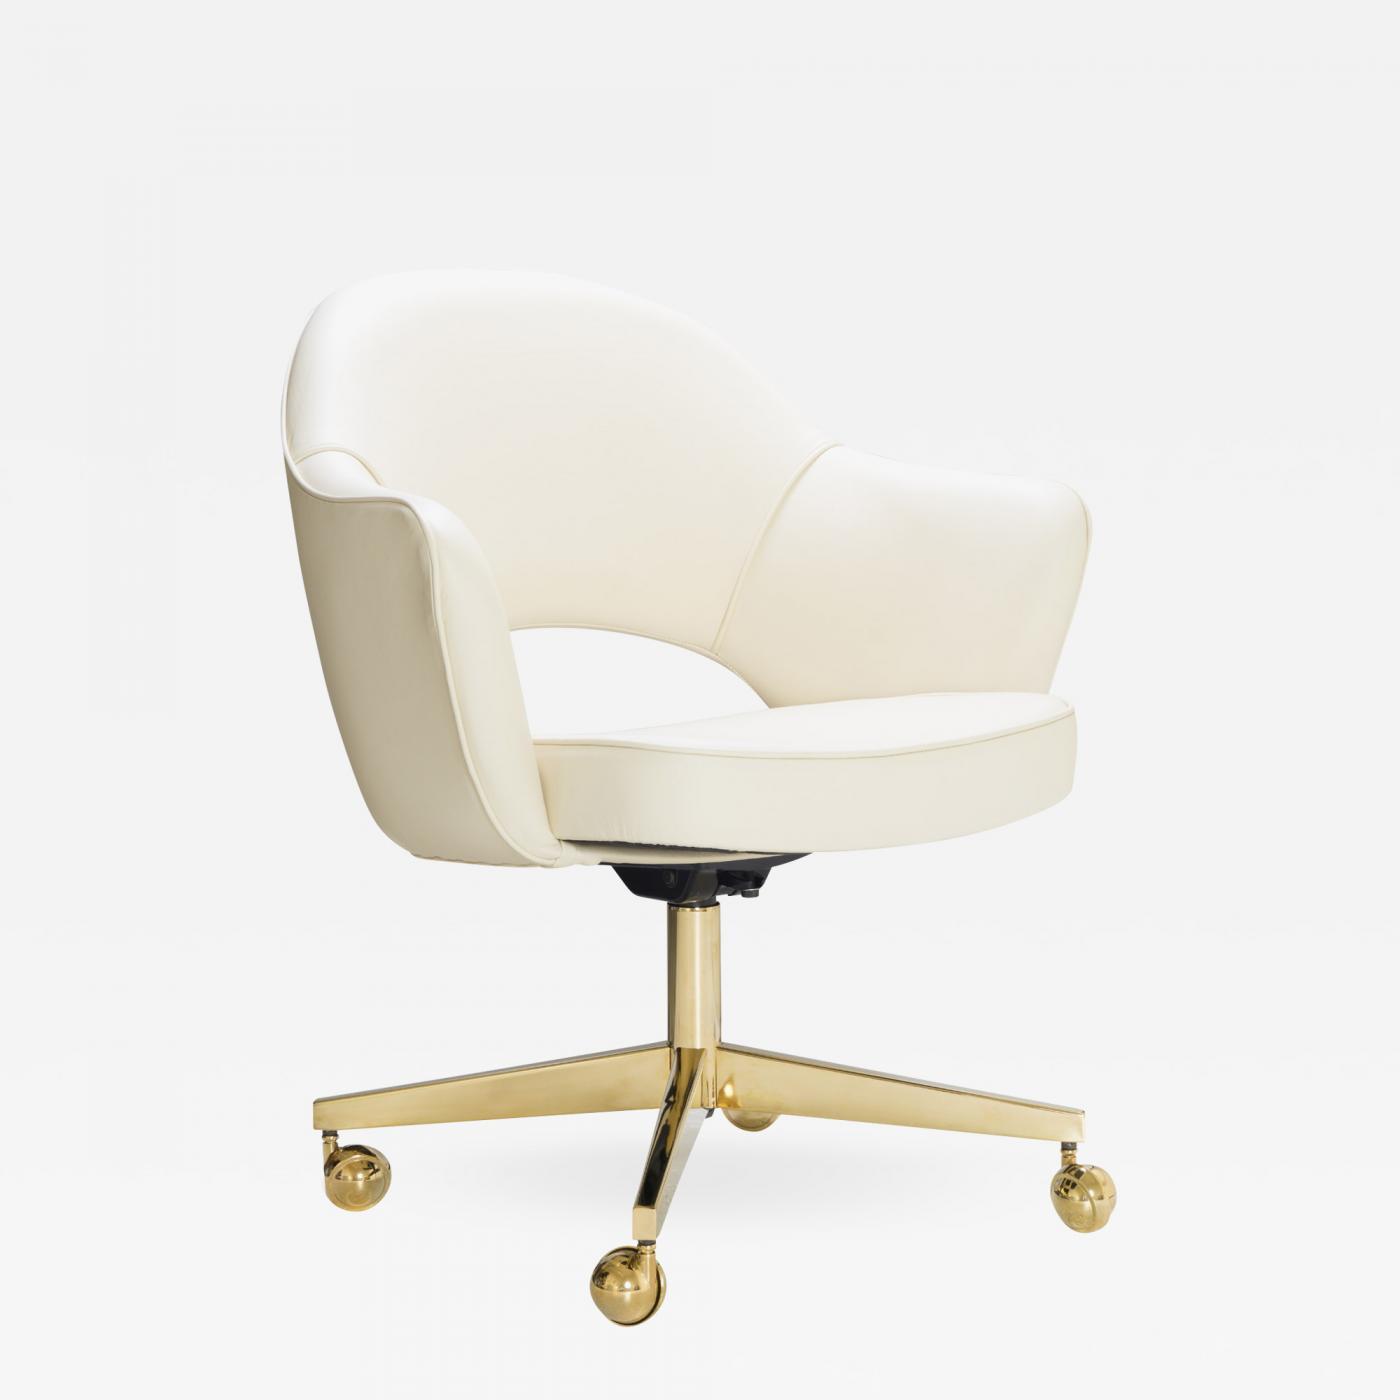 Eero Saarinen Saarinen Executive Arm Chair In Creme Leather Swivel Base 24k Gold Edition